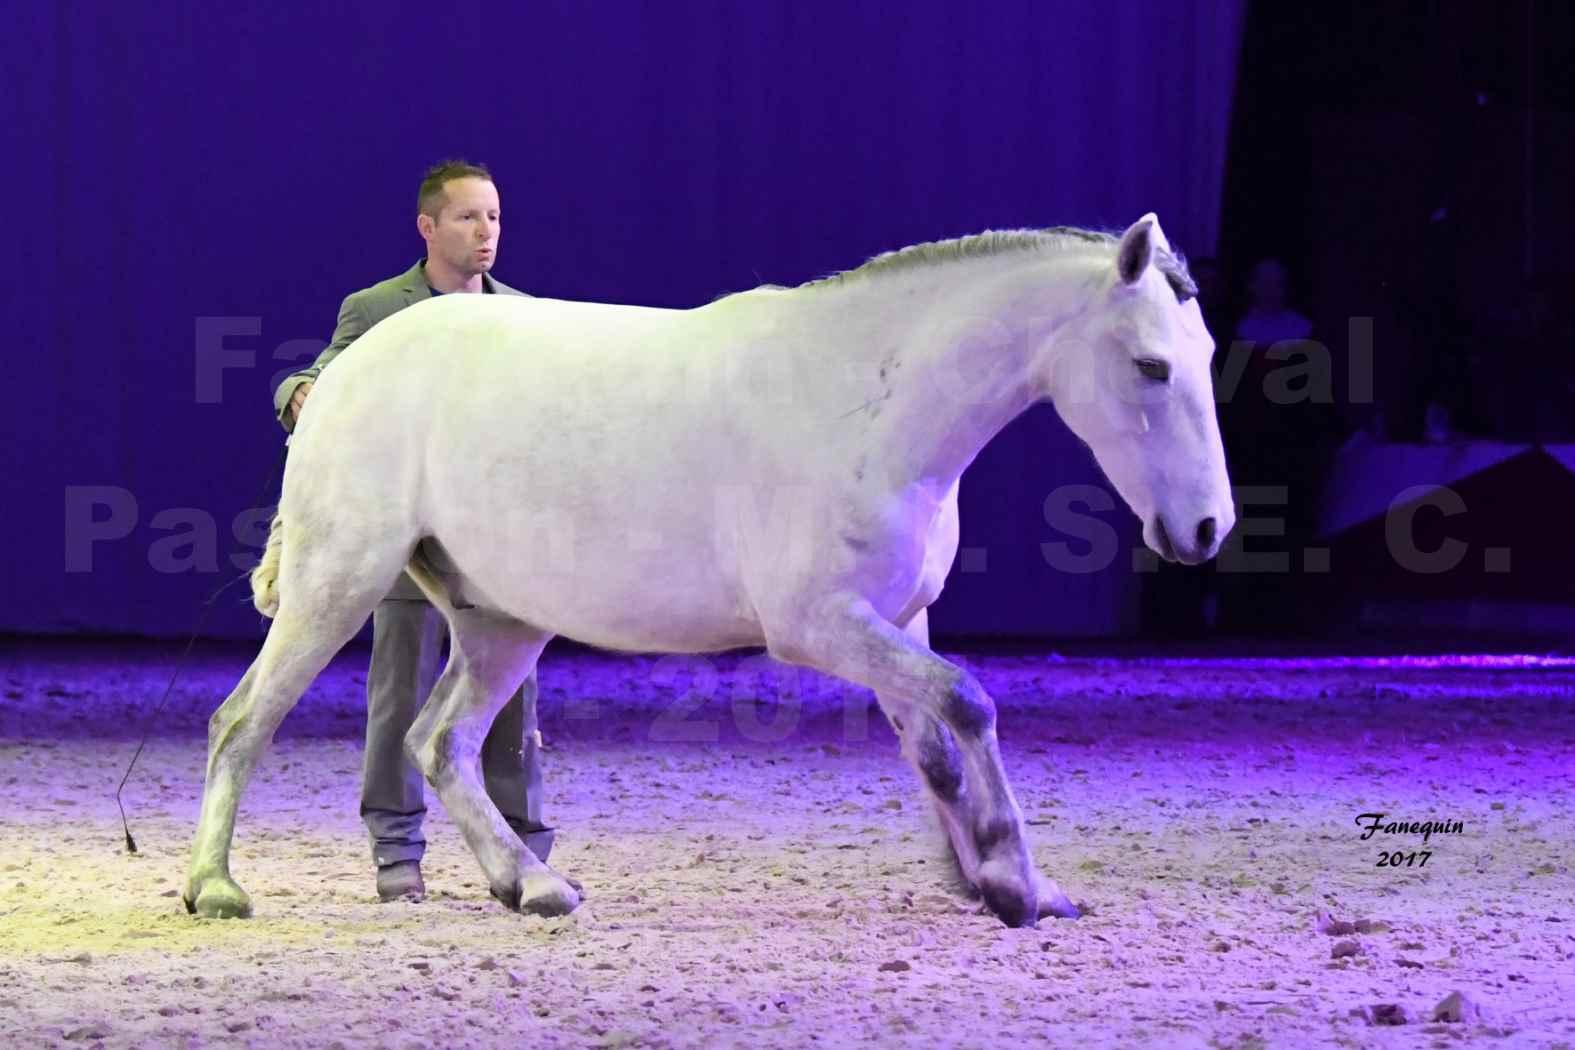 Cheval Passion 2017 - M. I. S. E. C. - Ludovic LONGO & 1 cheval en liberté - 04